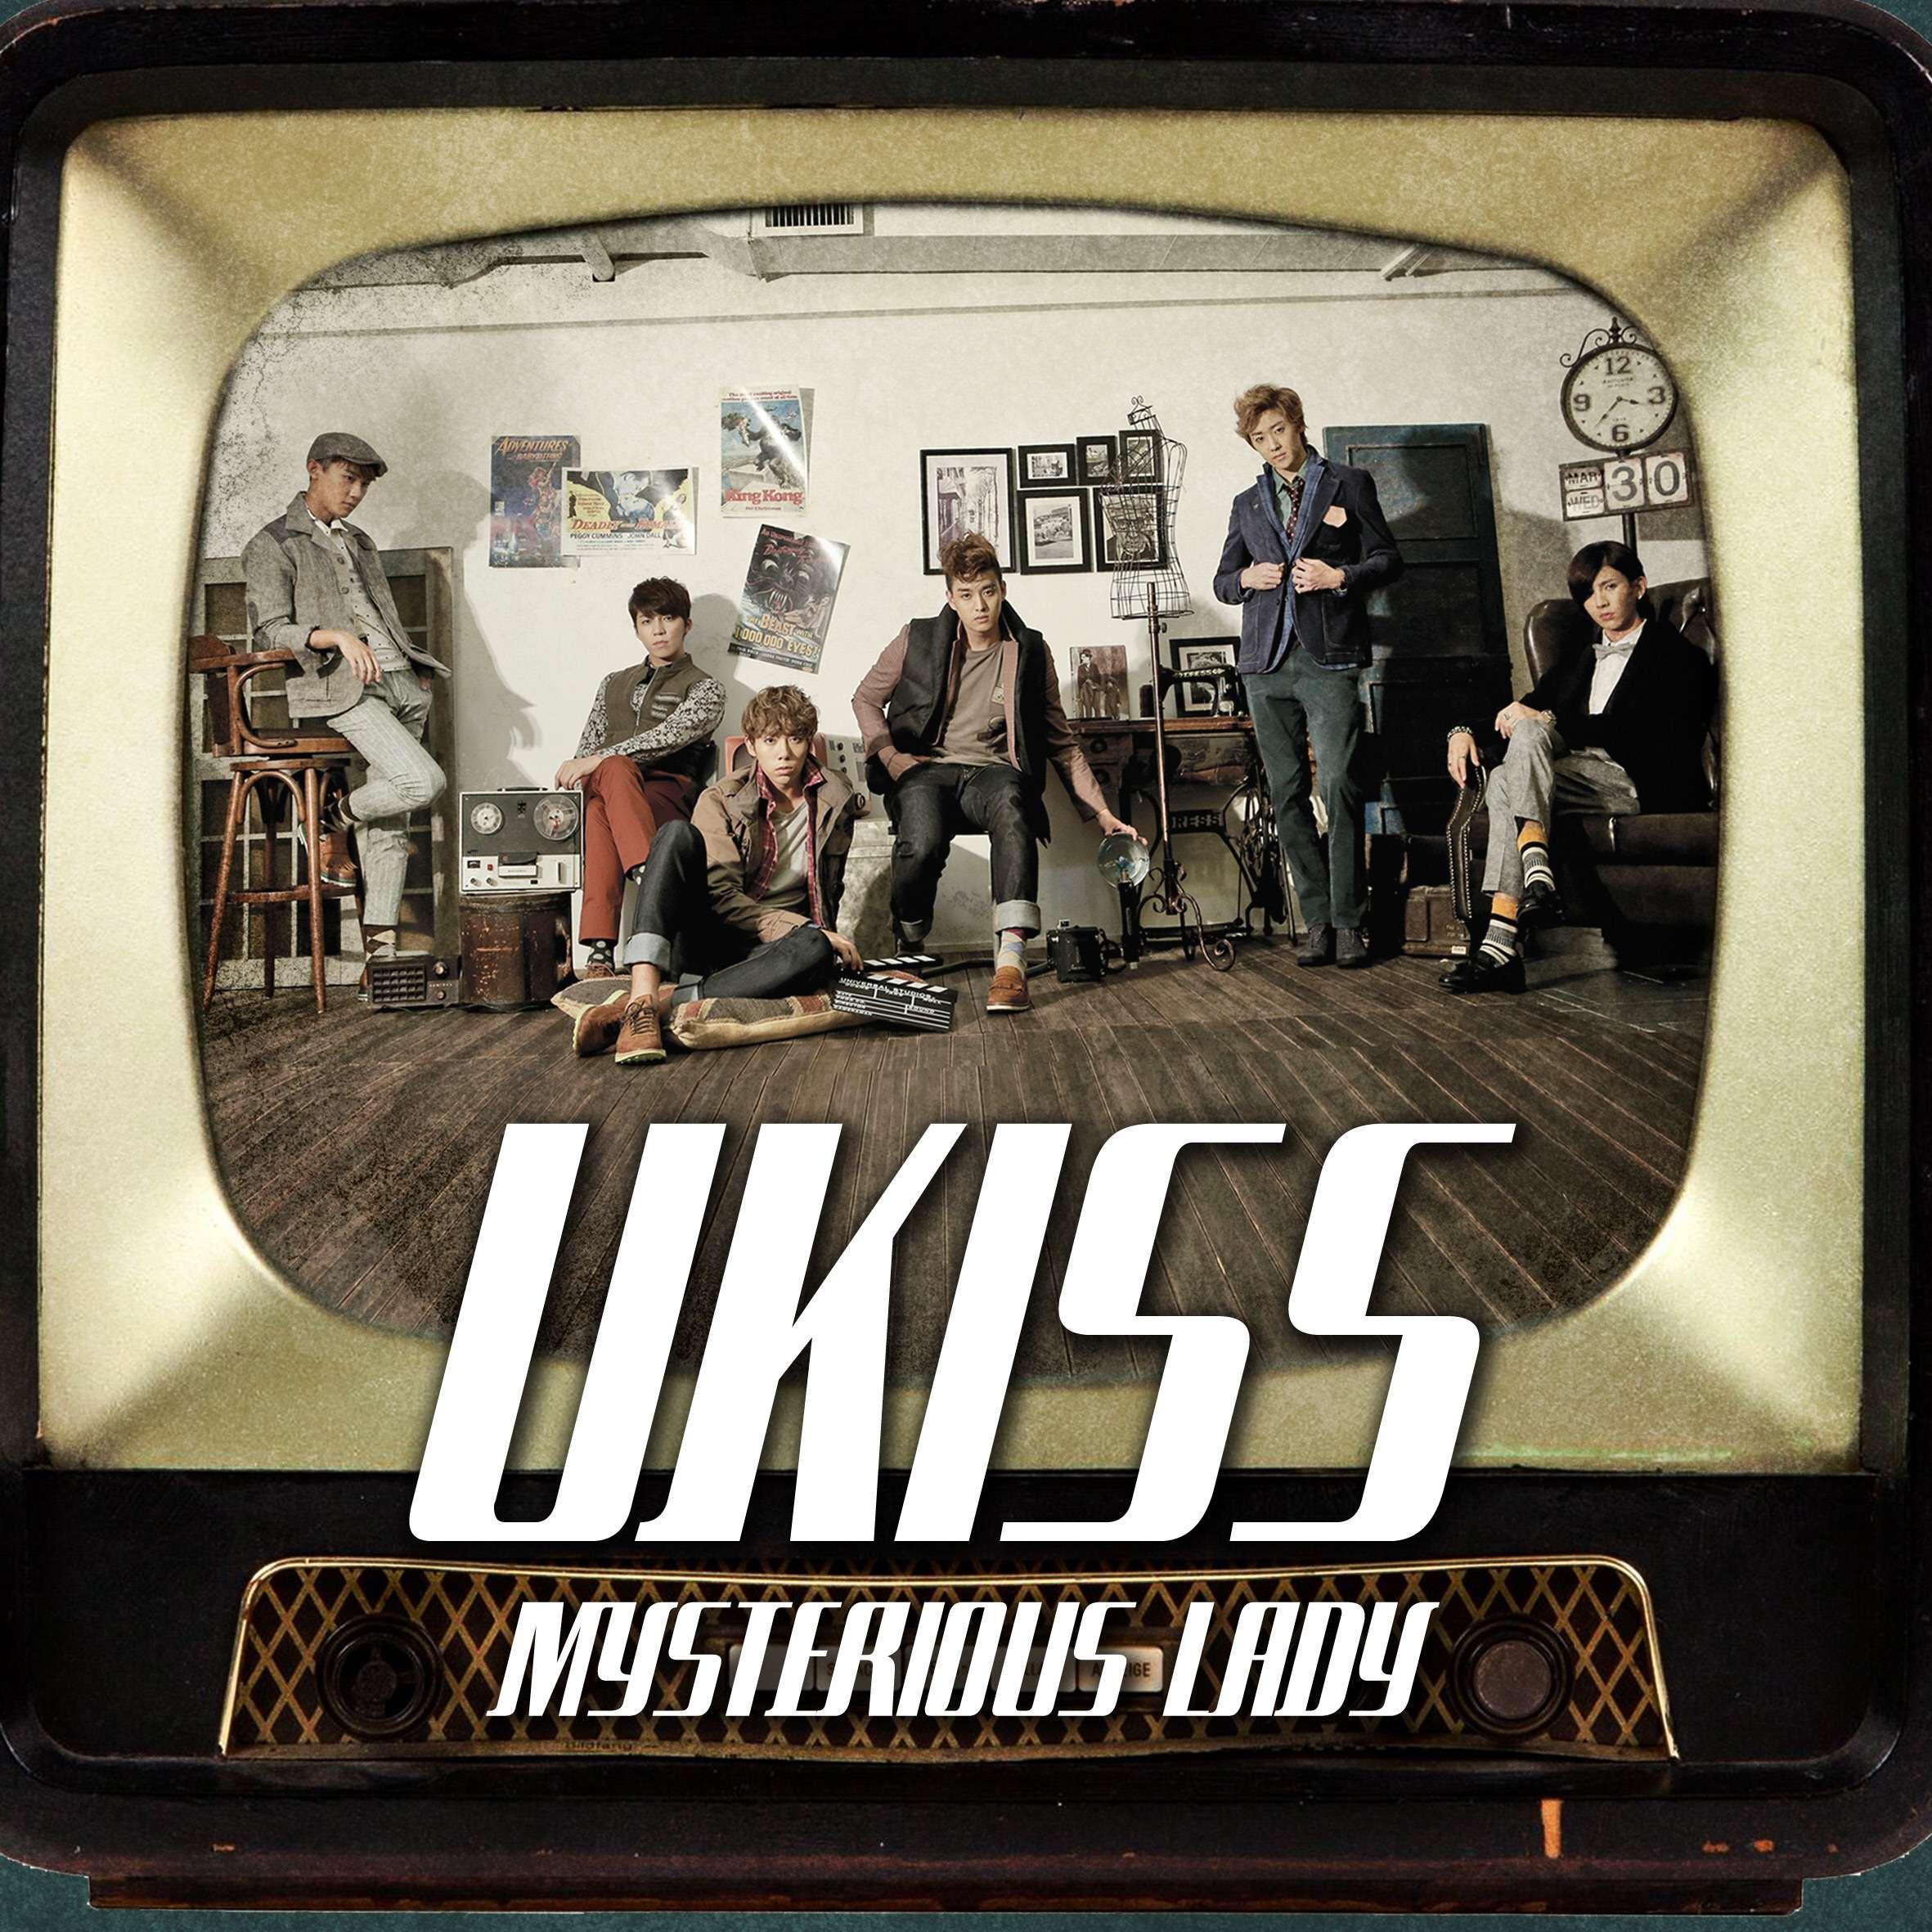 [Single] U-Kiss - Mysterious Lady [Digital Single]